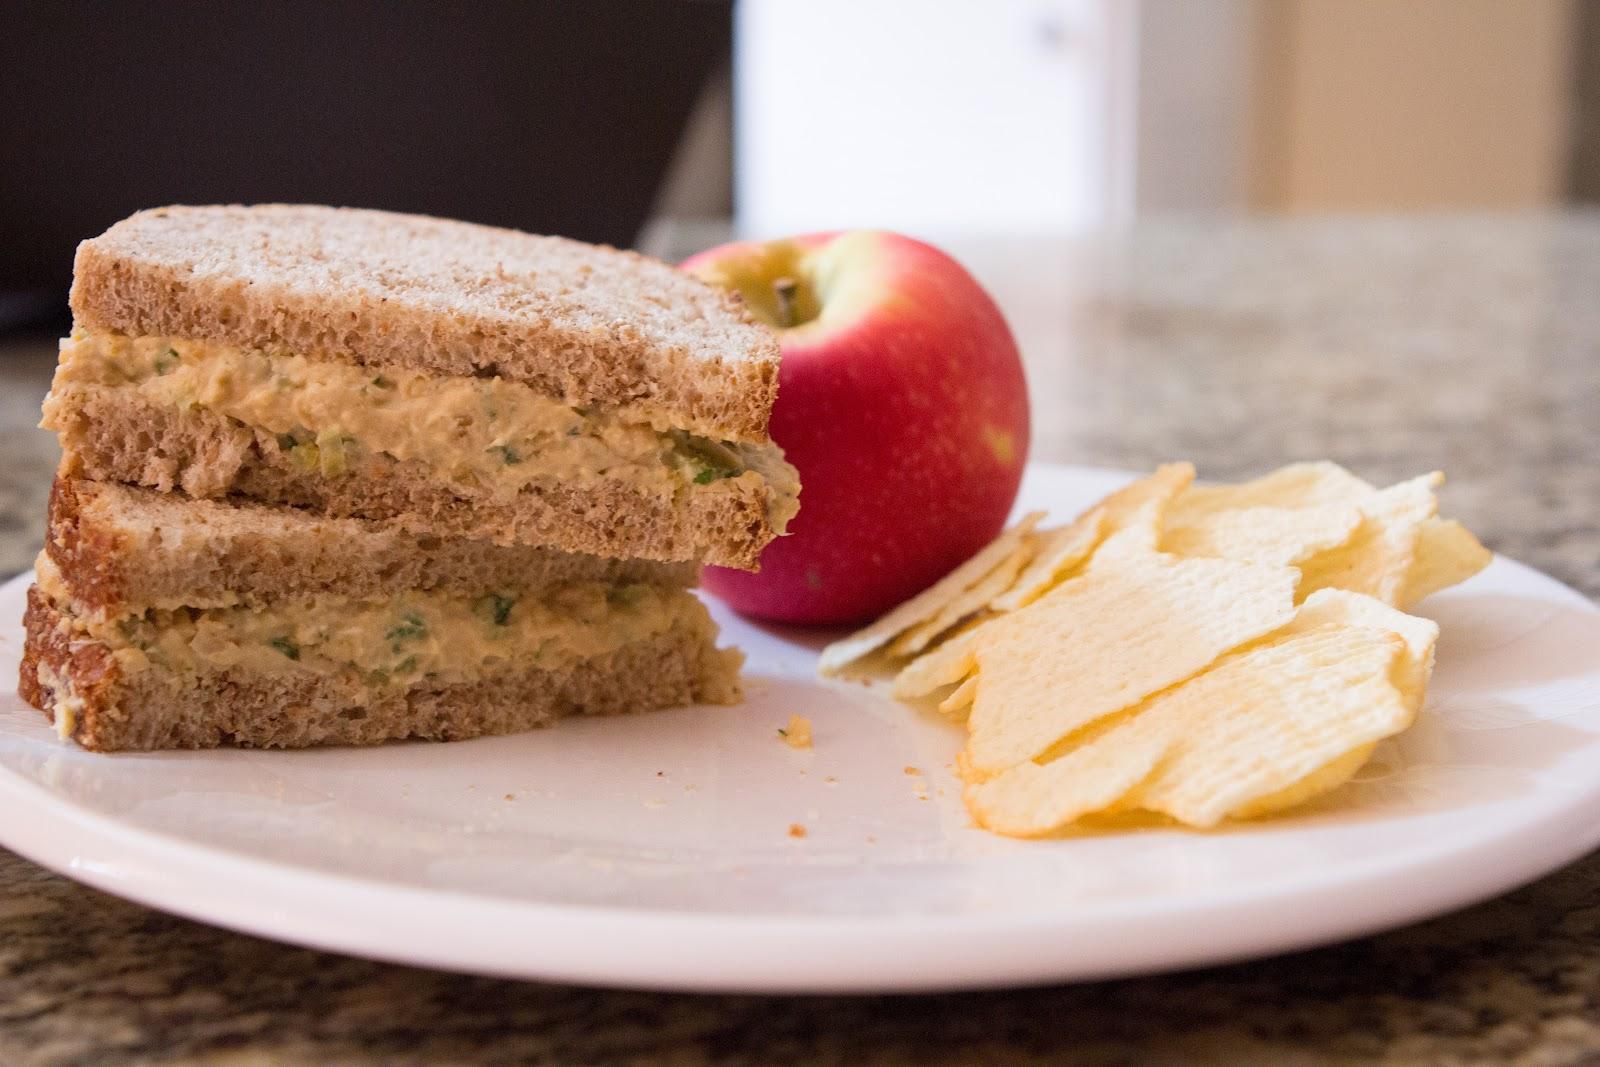 VEGETARIAN CHICKPEA SANDWICH SPREAD